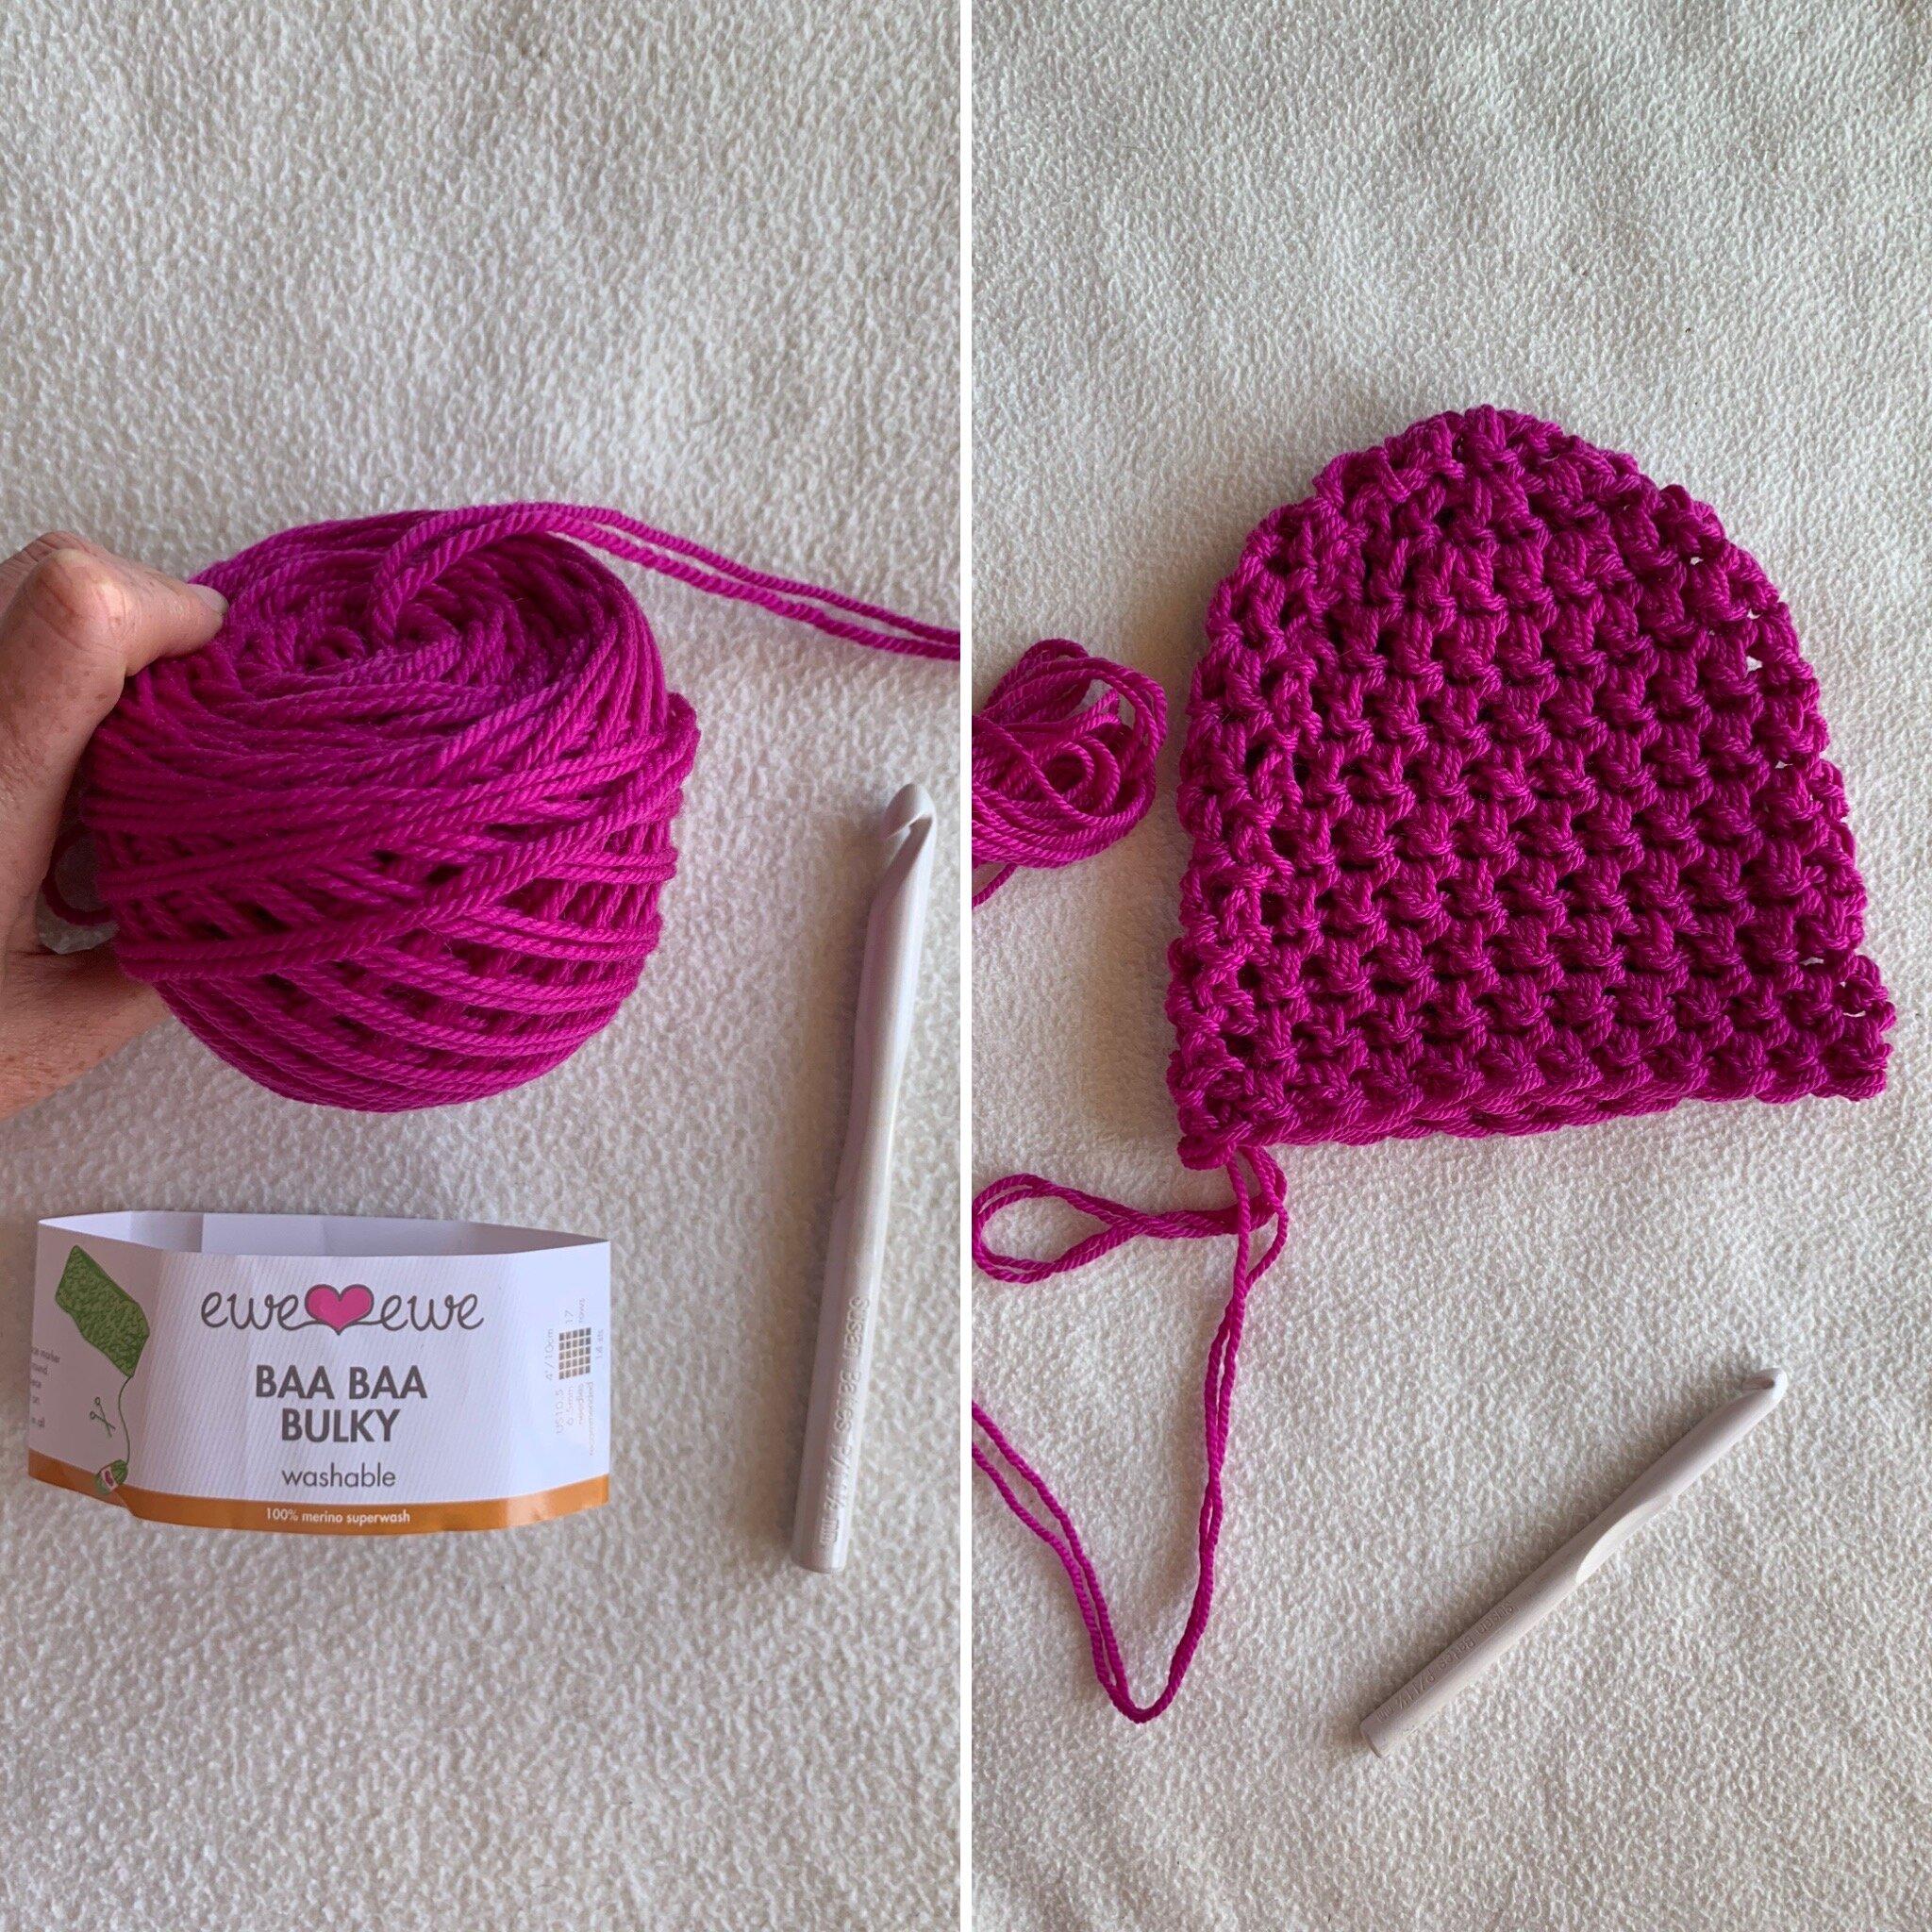 Quick crochet hat using Baa Baa Bulky merino wool yarn held double